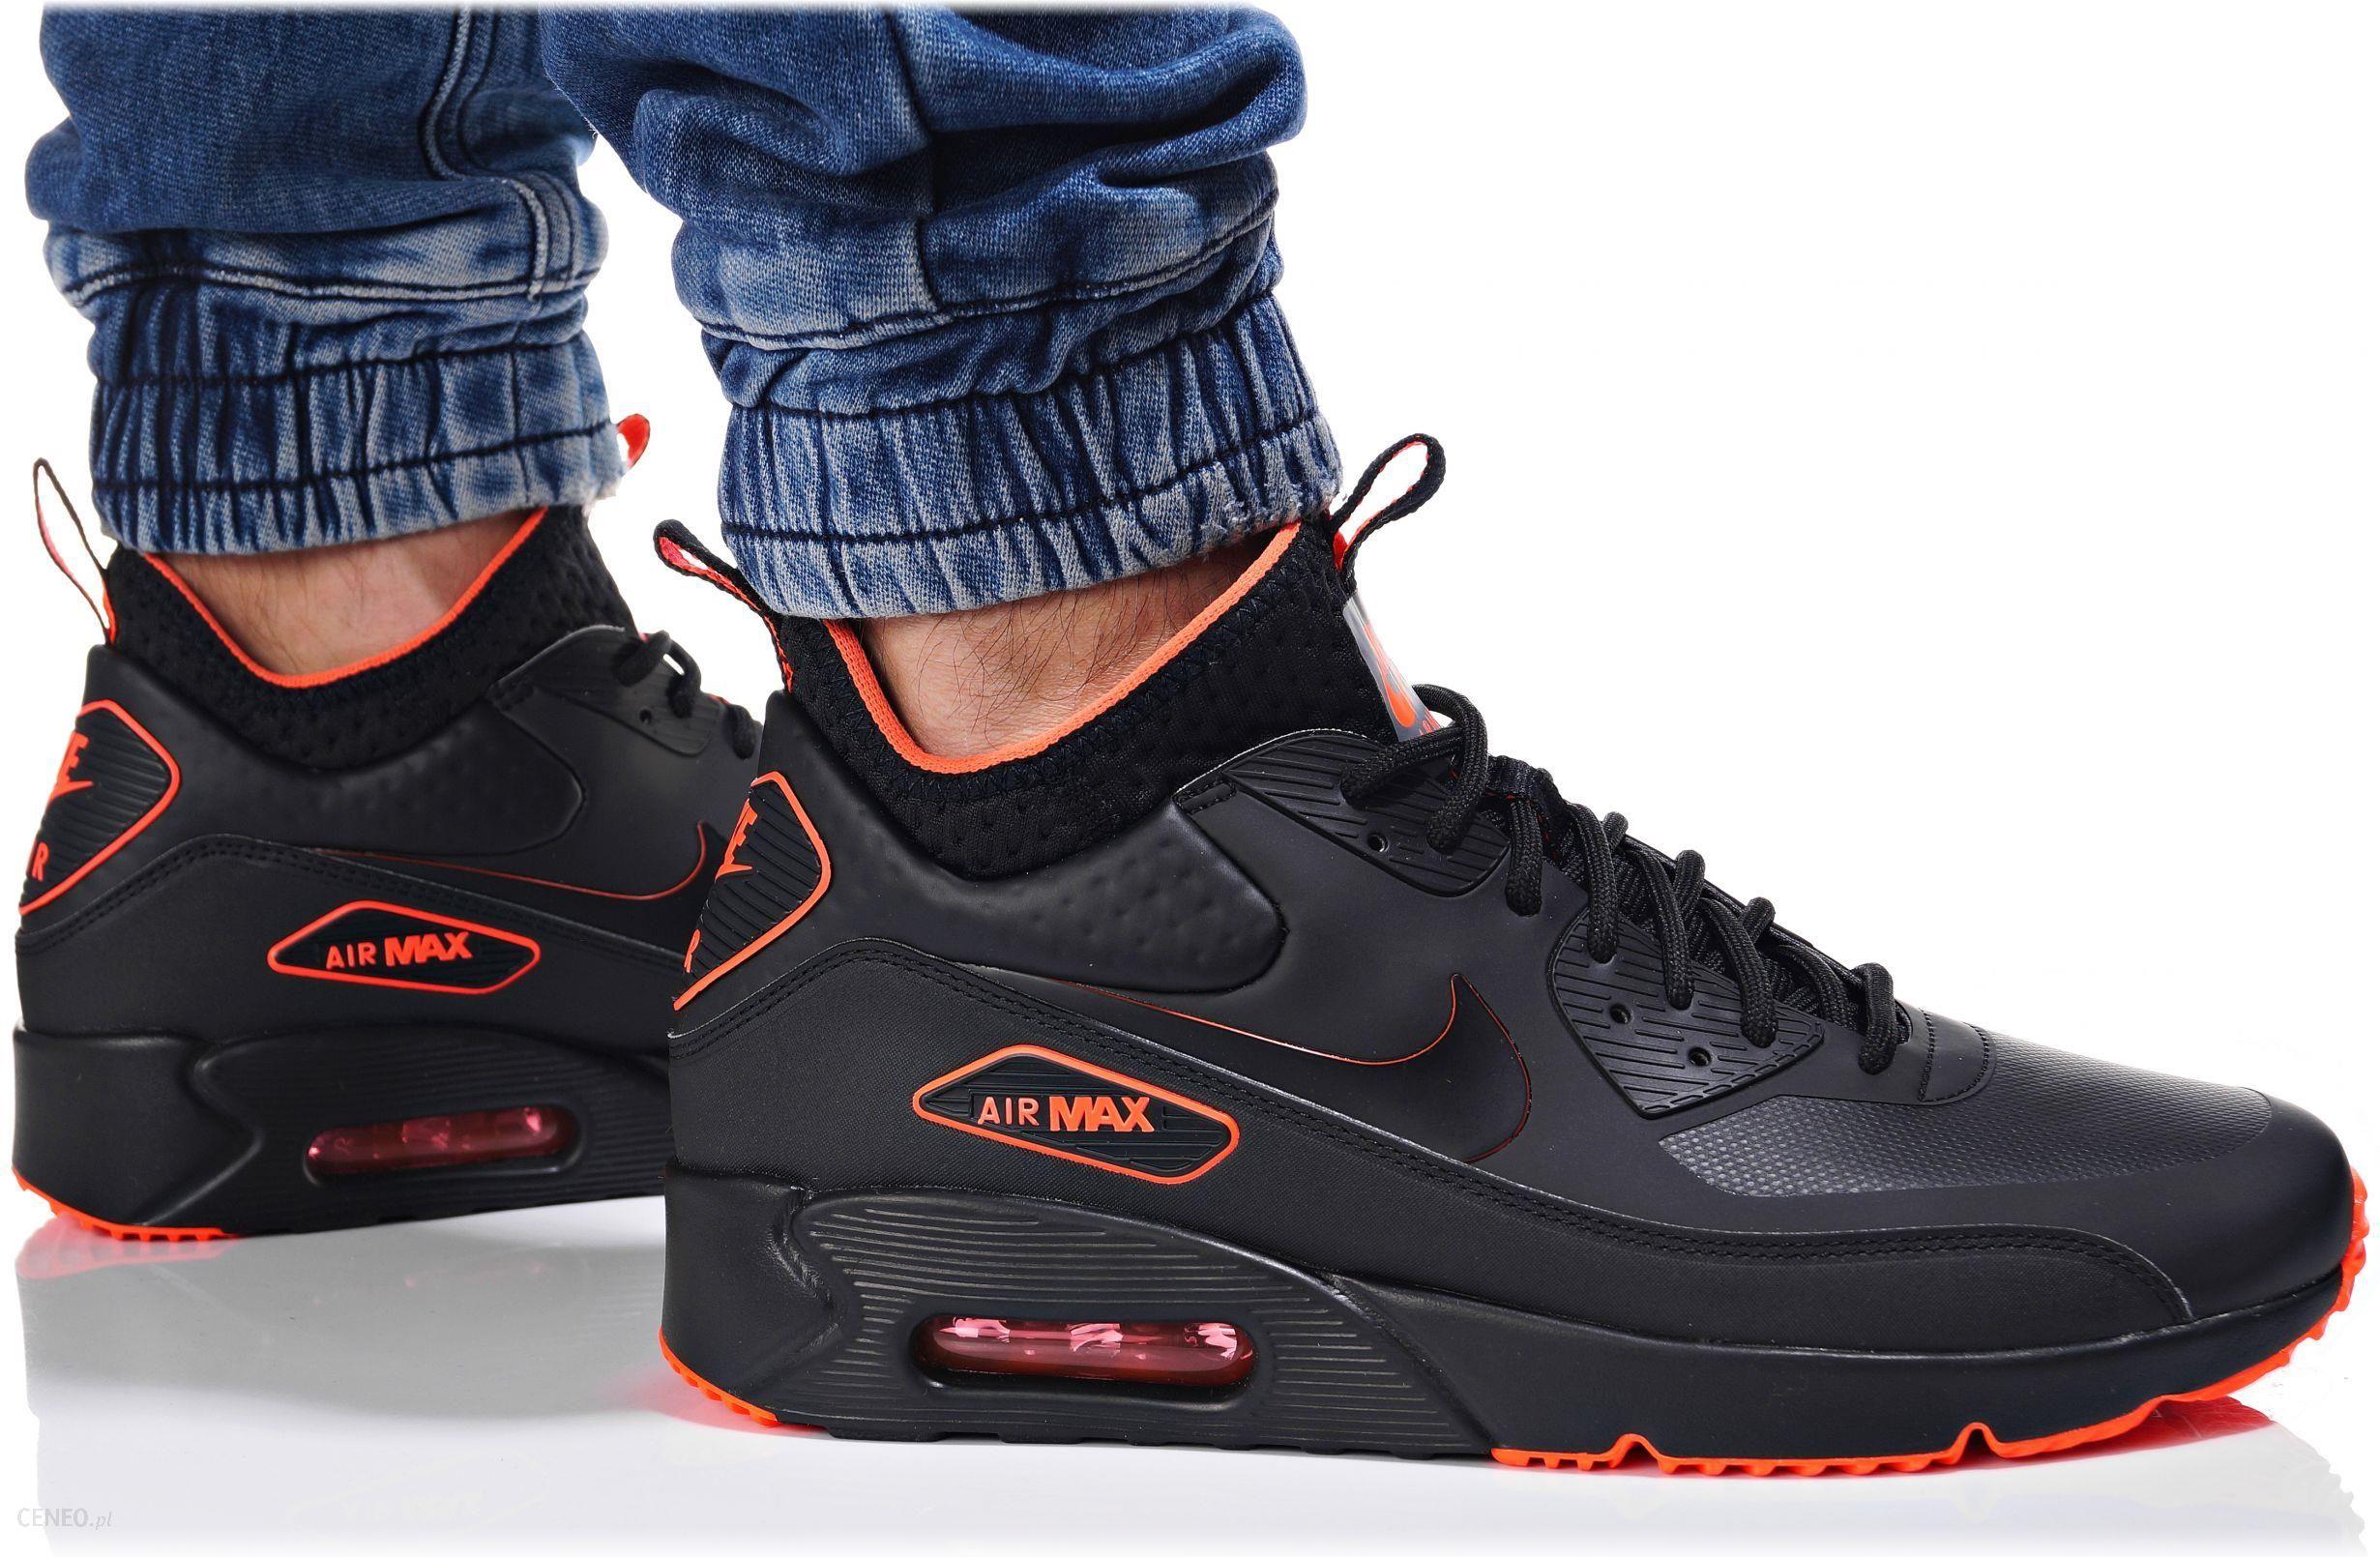 Buty Nike Air Max 90 Ultra MID Męskie AA4423 001 Ceny i opinie Ceneo.pl